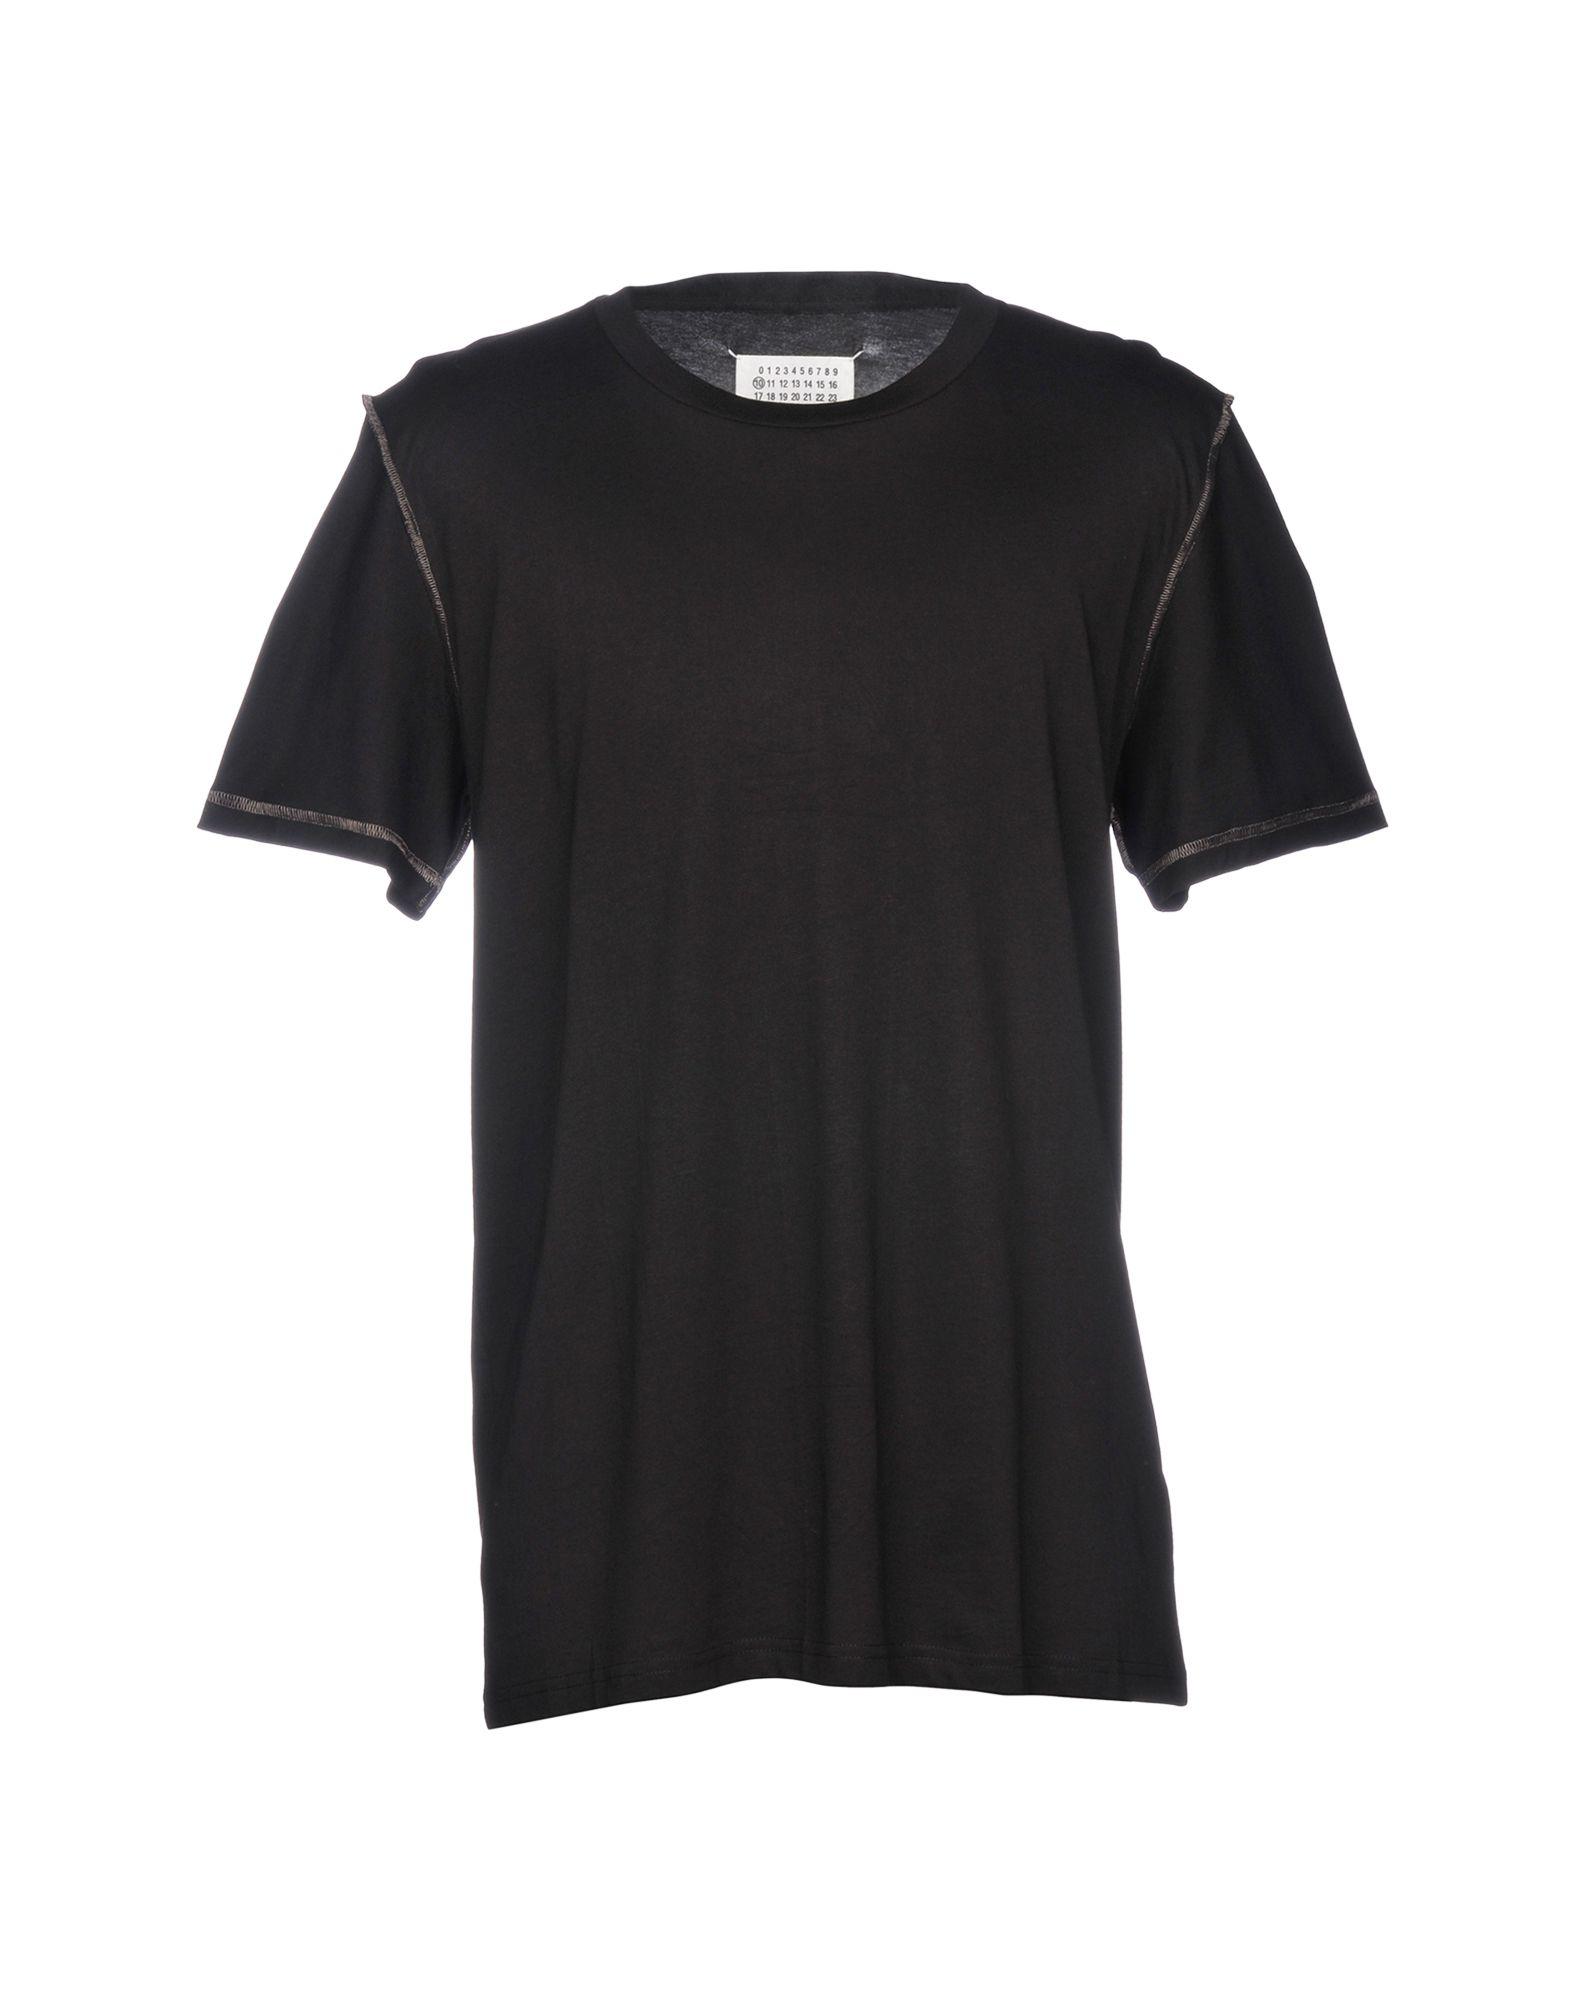 T-Shirt Maison Margiela Uomo Uomo Margiela - 12200147TT adedb8